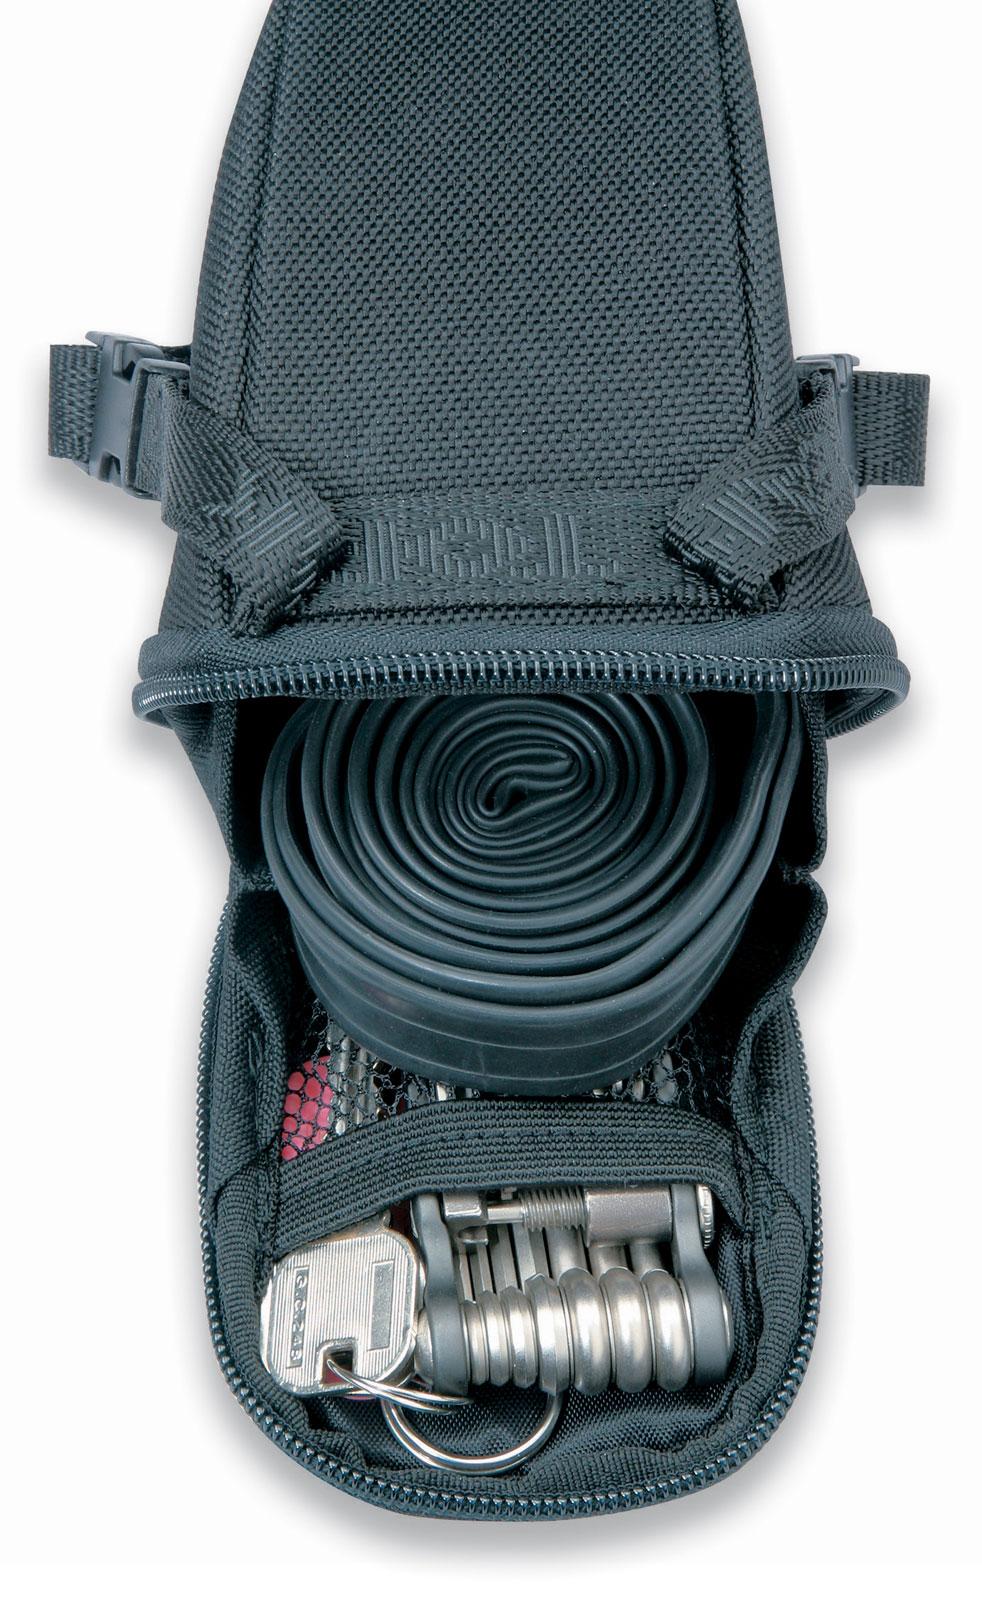 Topeak-Aero-Wedge-Pack-Strap-On-Seat-Mounted-Bag-for-27-2-34-9mm-Seatposts thumbnail 2